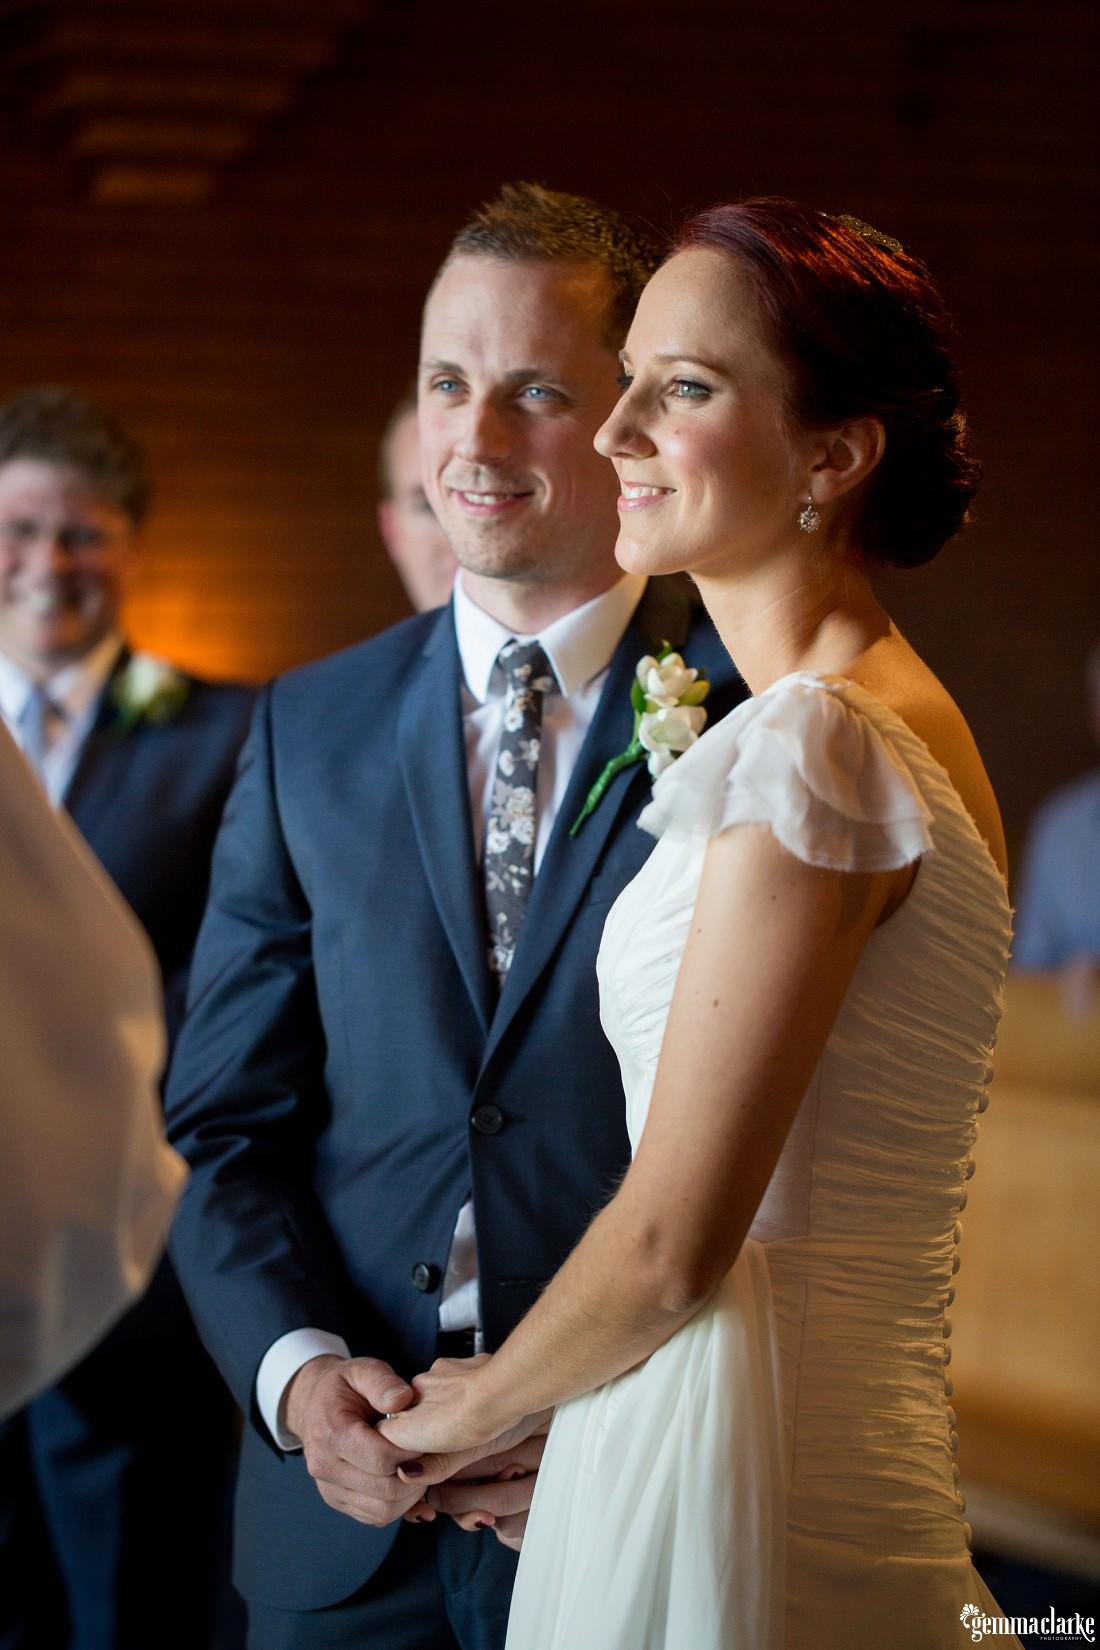 gemma-clarke-photography_southern-highlands-wedding_biota-dining-wedding_ashley-and-hally_0037